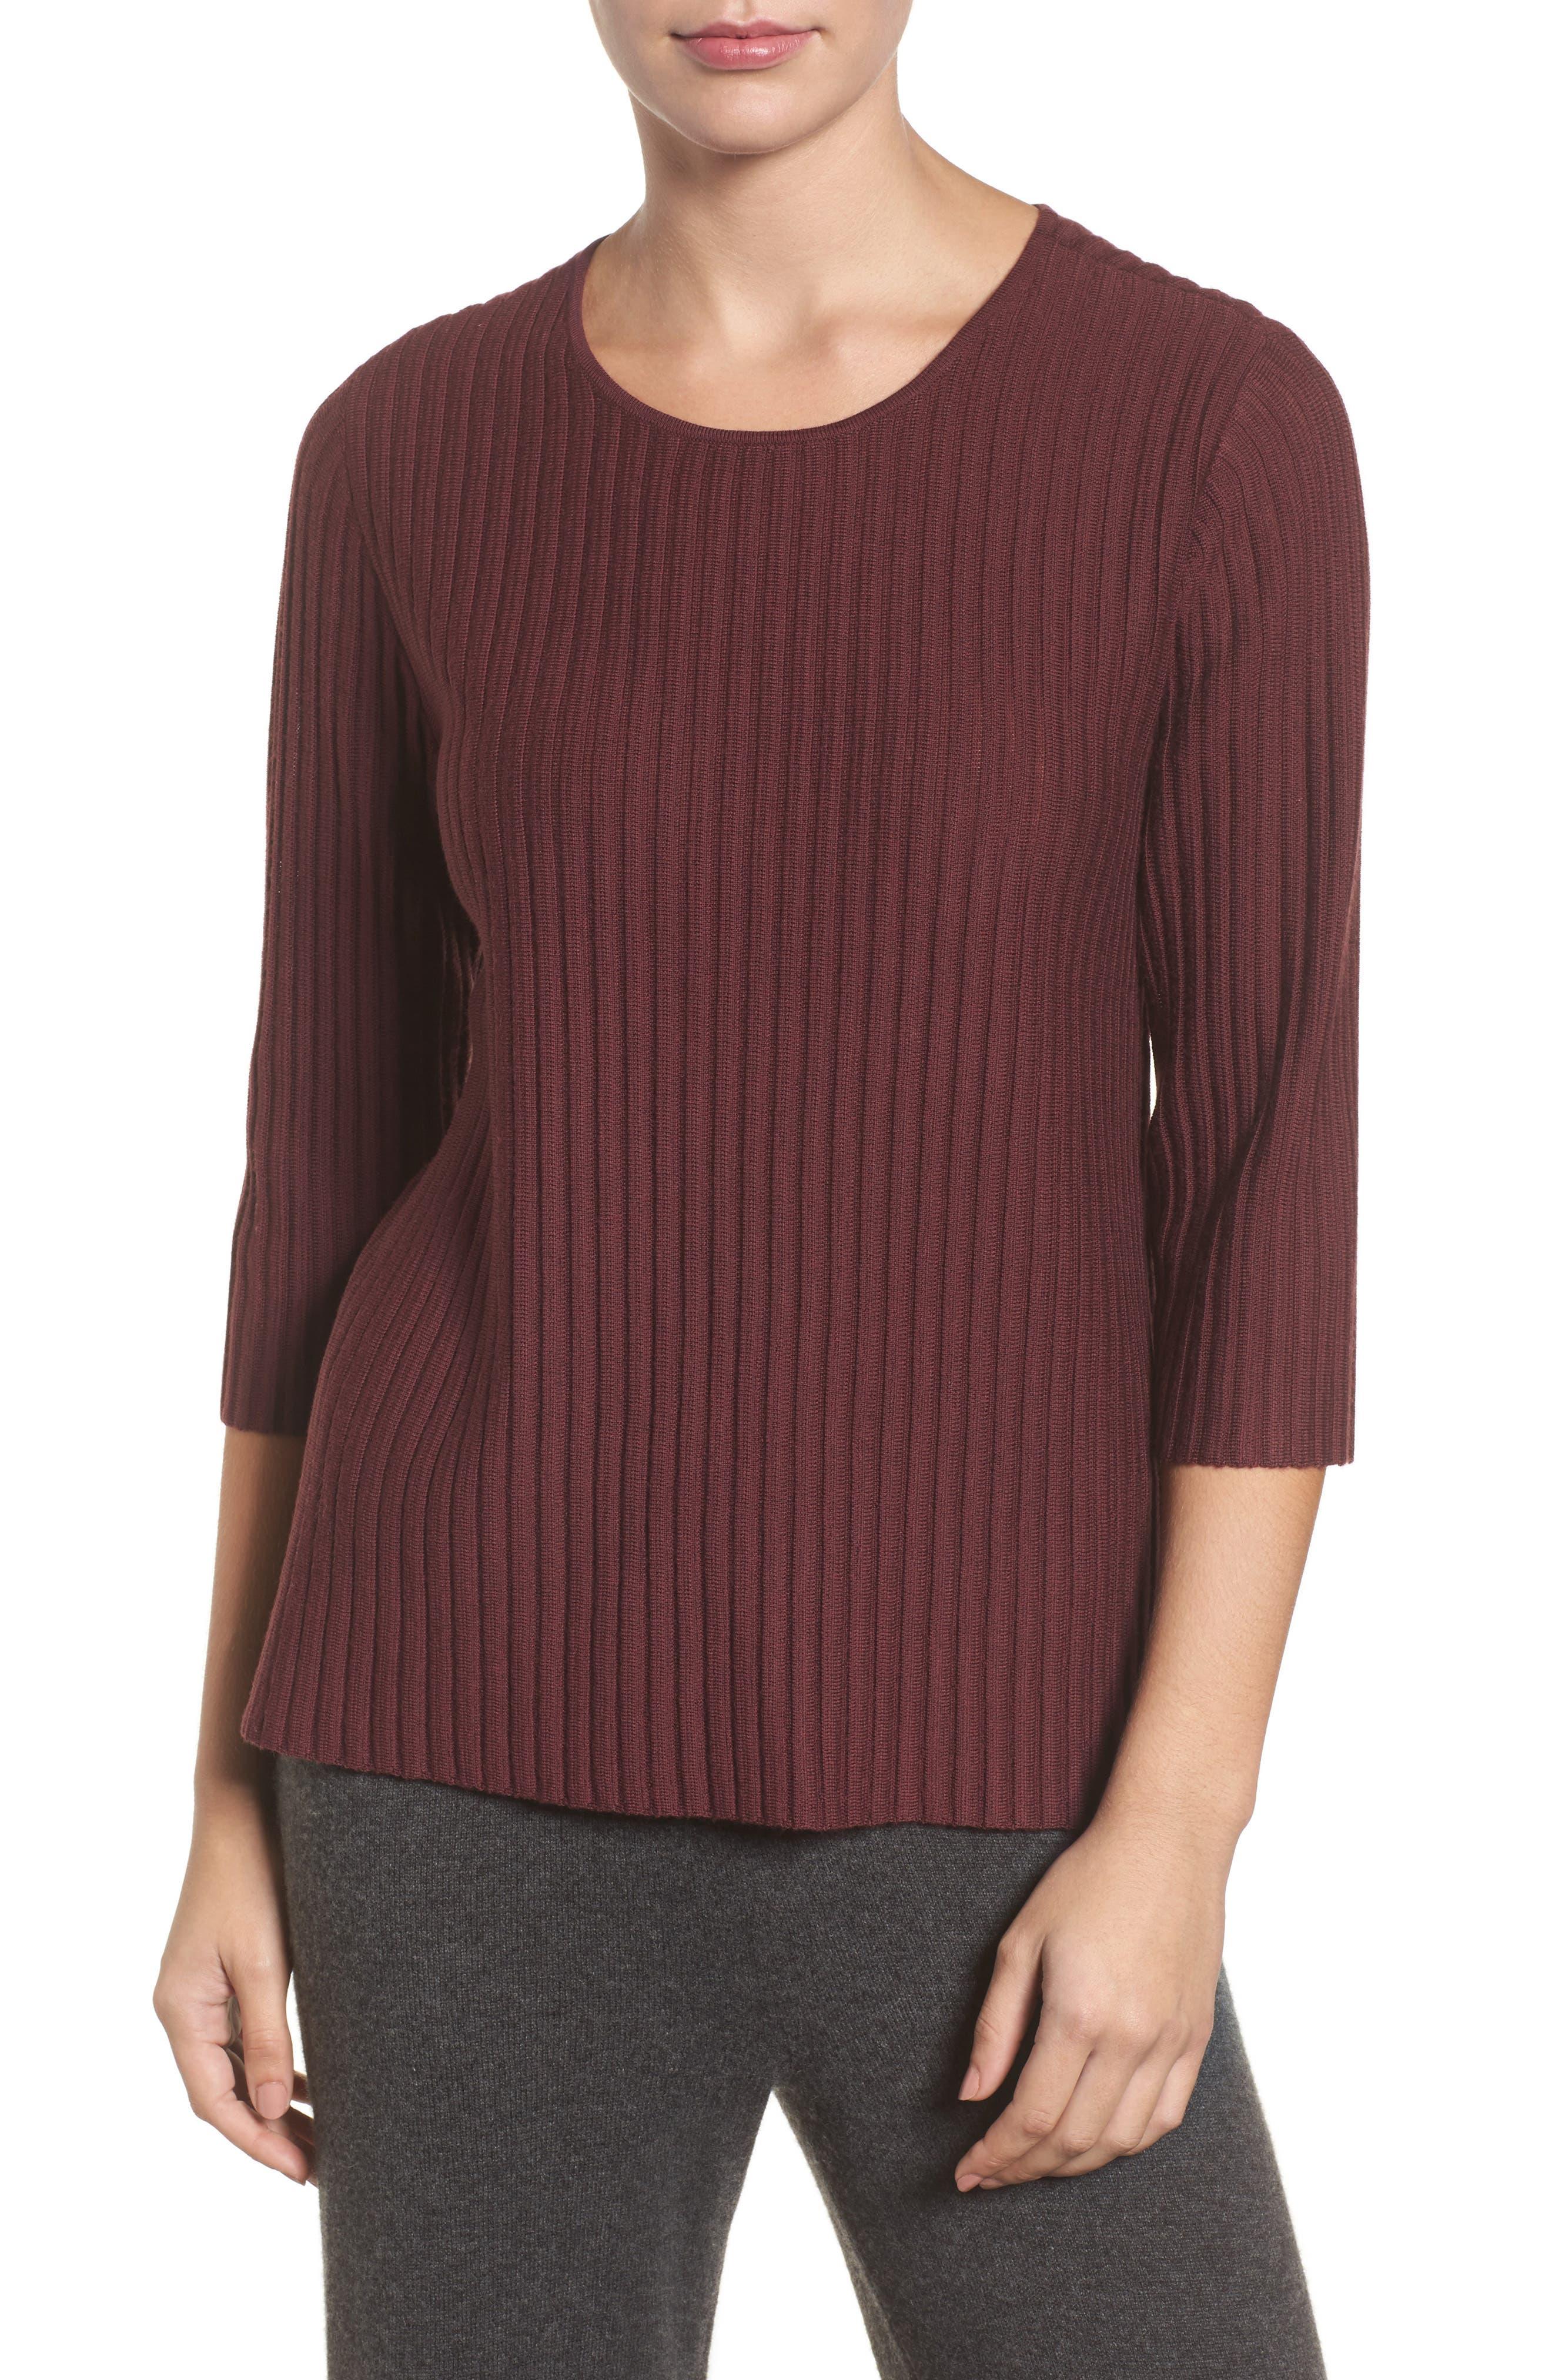 Alternate Image 1 Selected - Eileen Fisher Ribbed Merino Wool Sweater (Regular & Petite)